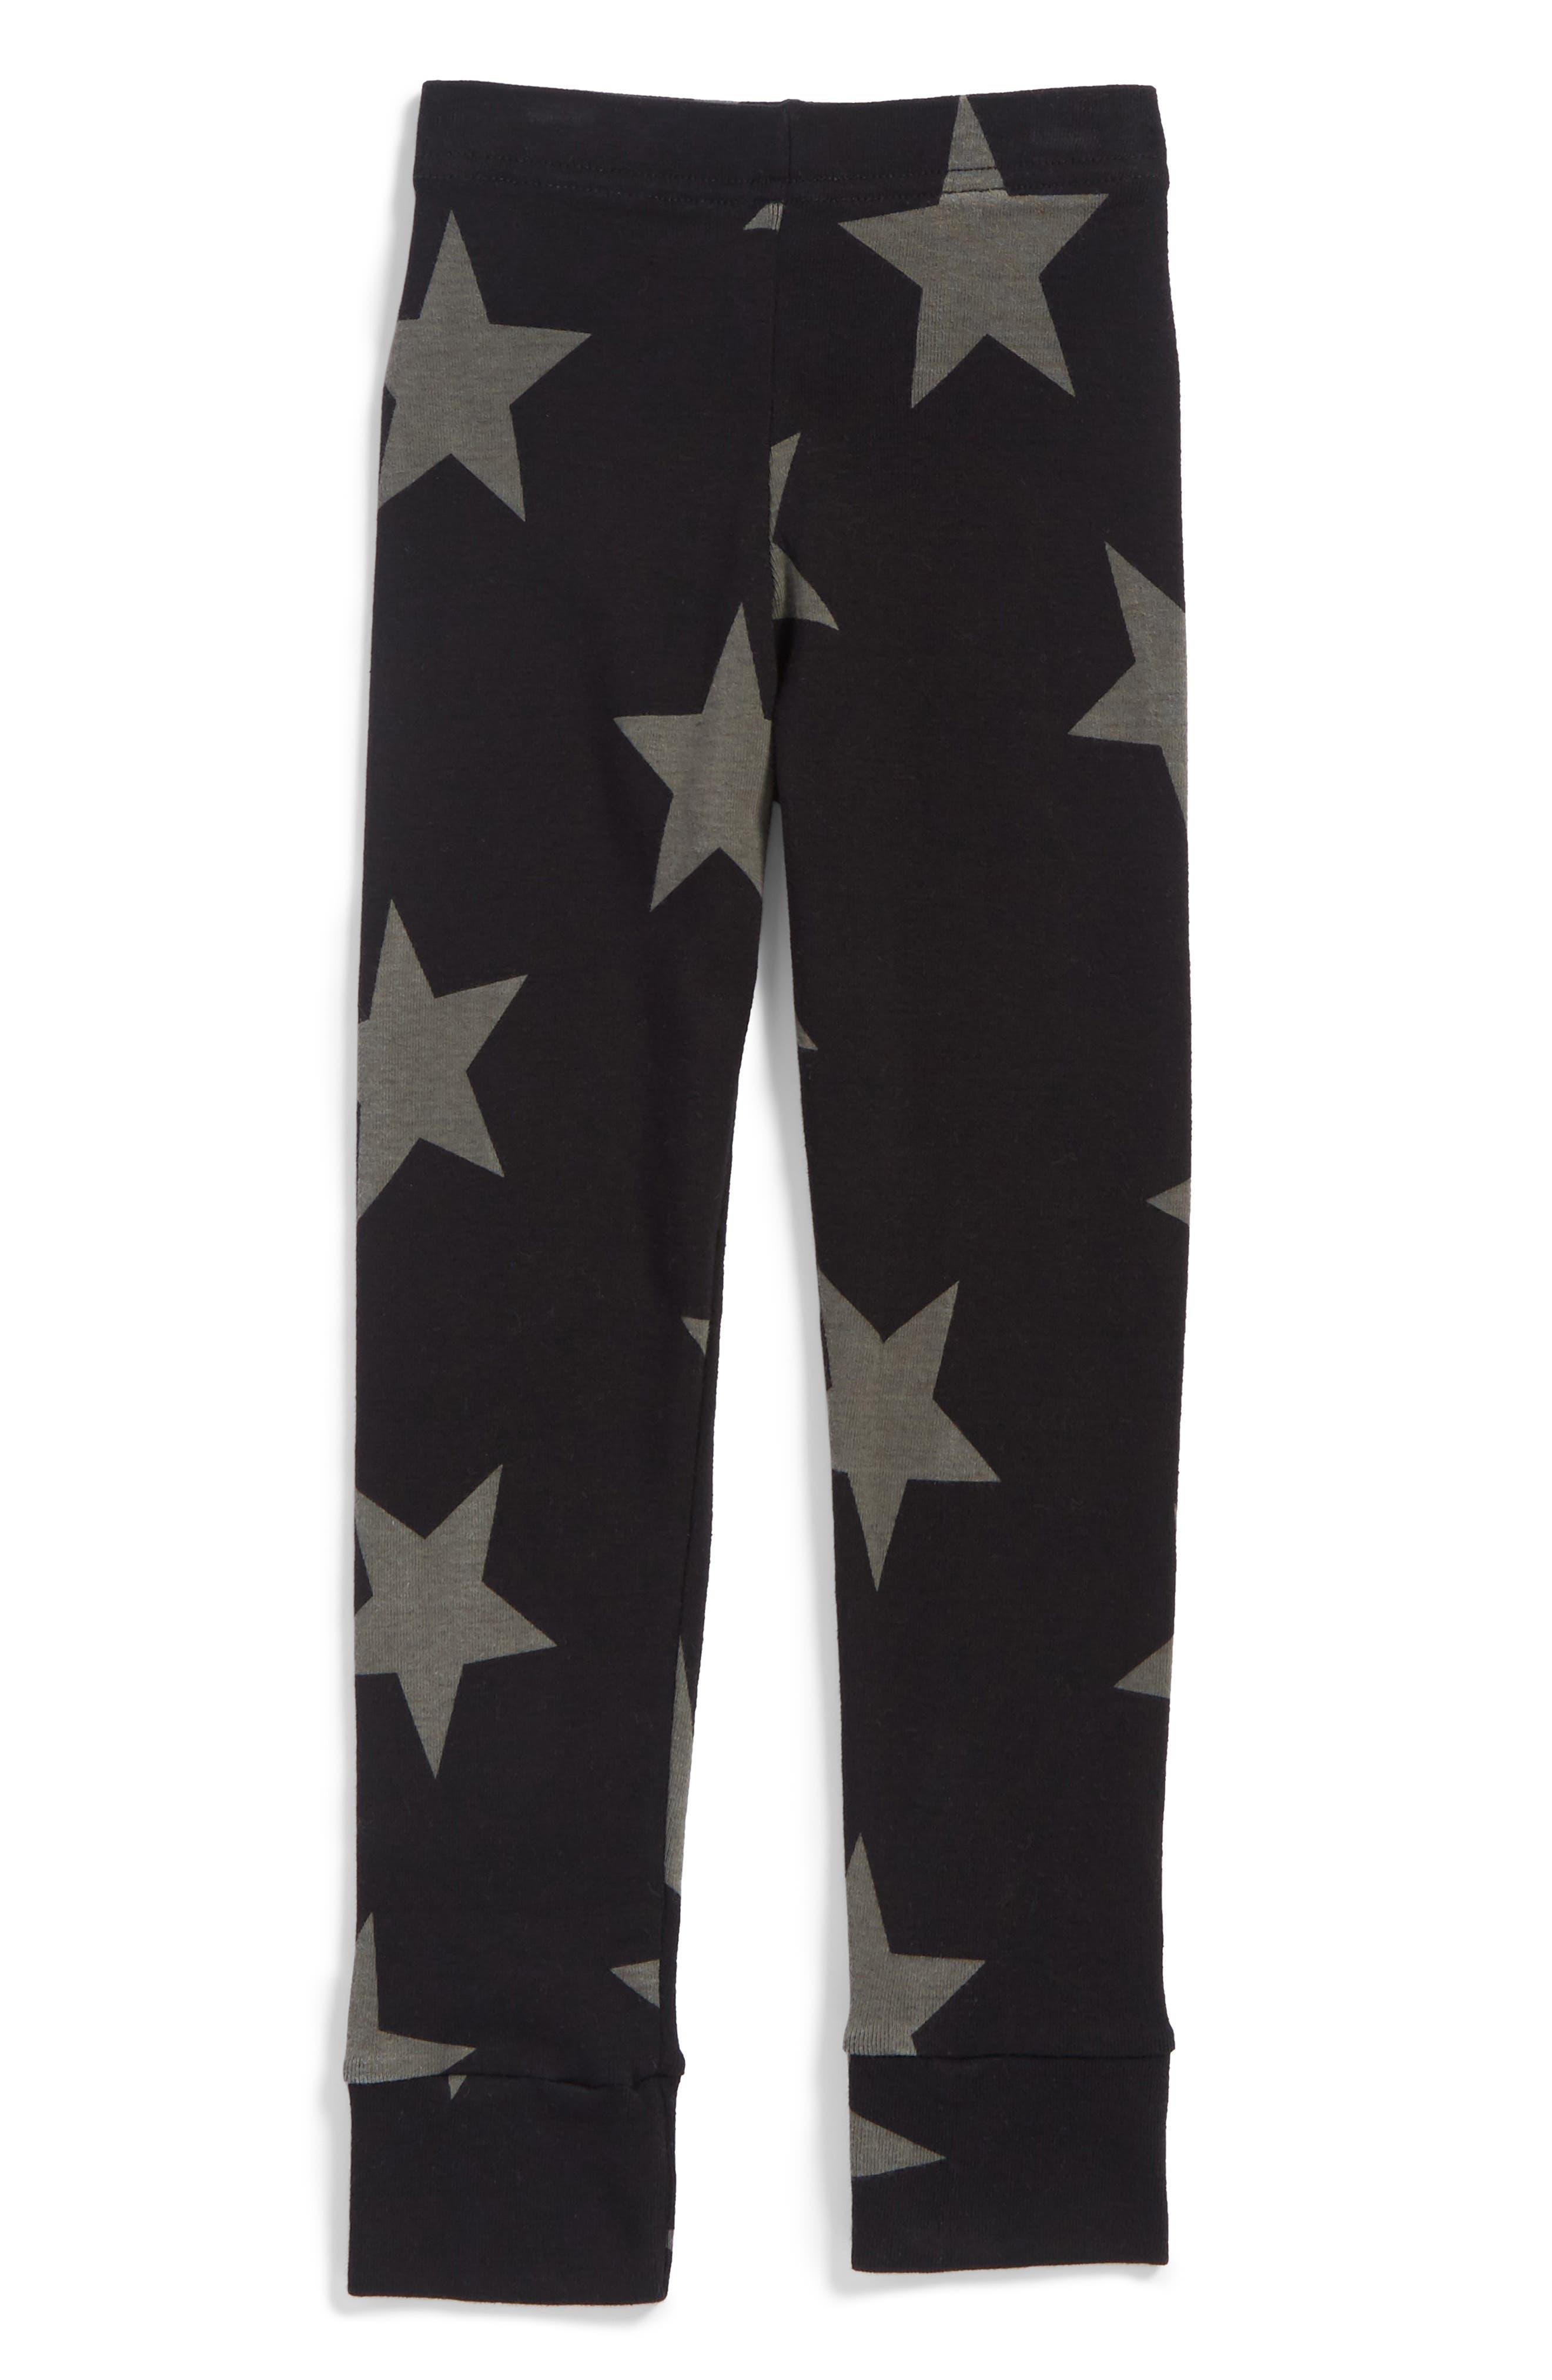 Toddler Girls Nununu Star Print Leggings Size 34Y  Black